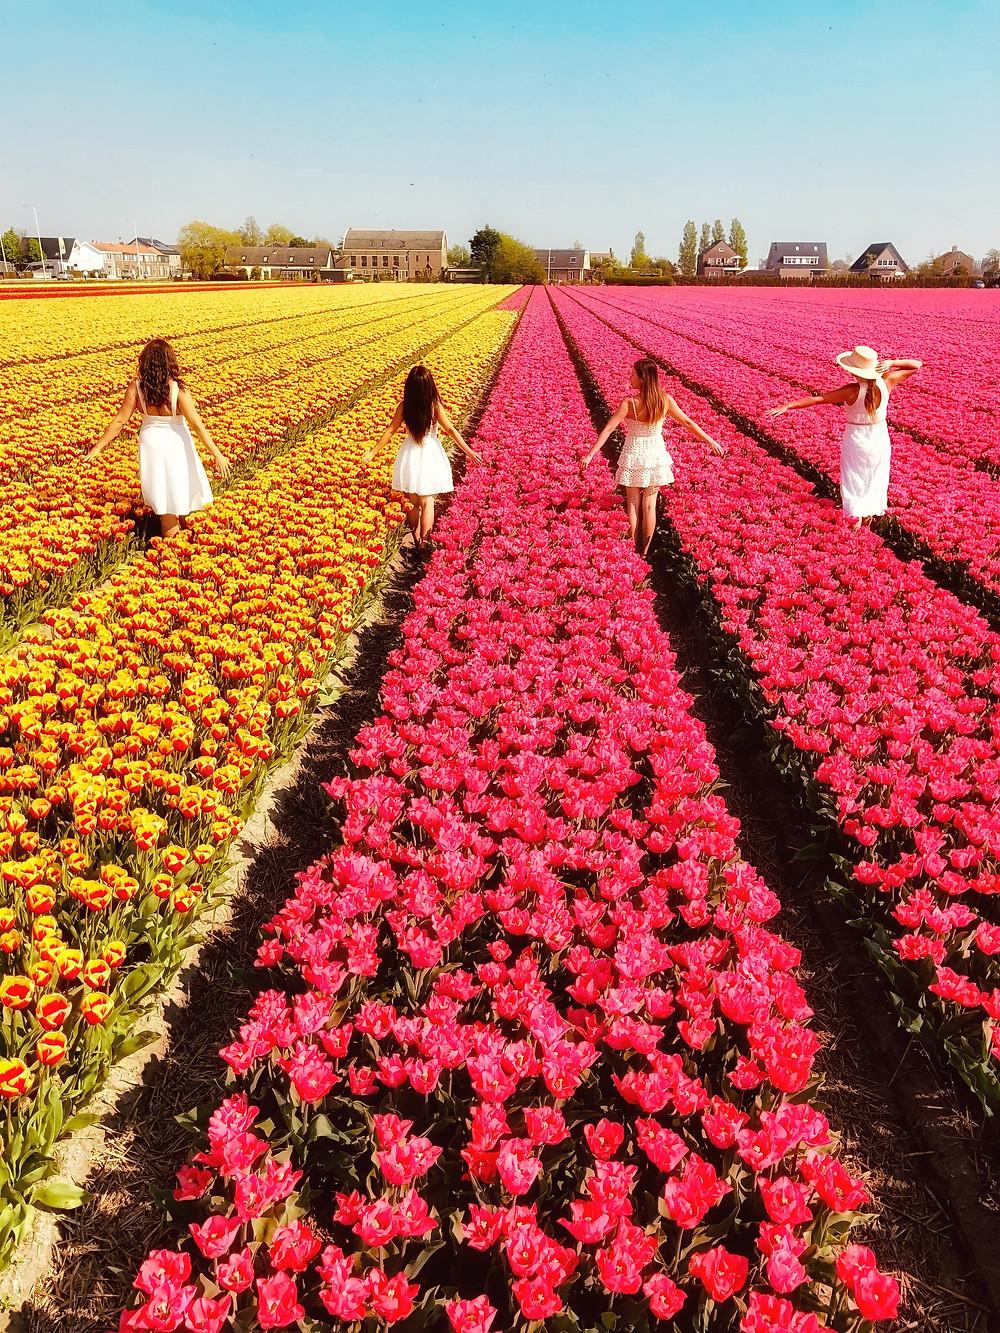 Tulip fields Hillegom, the Netherlands